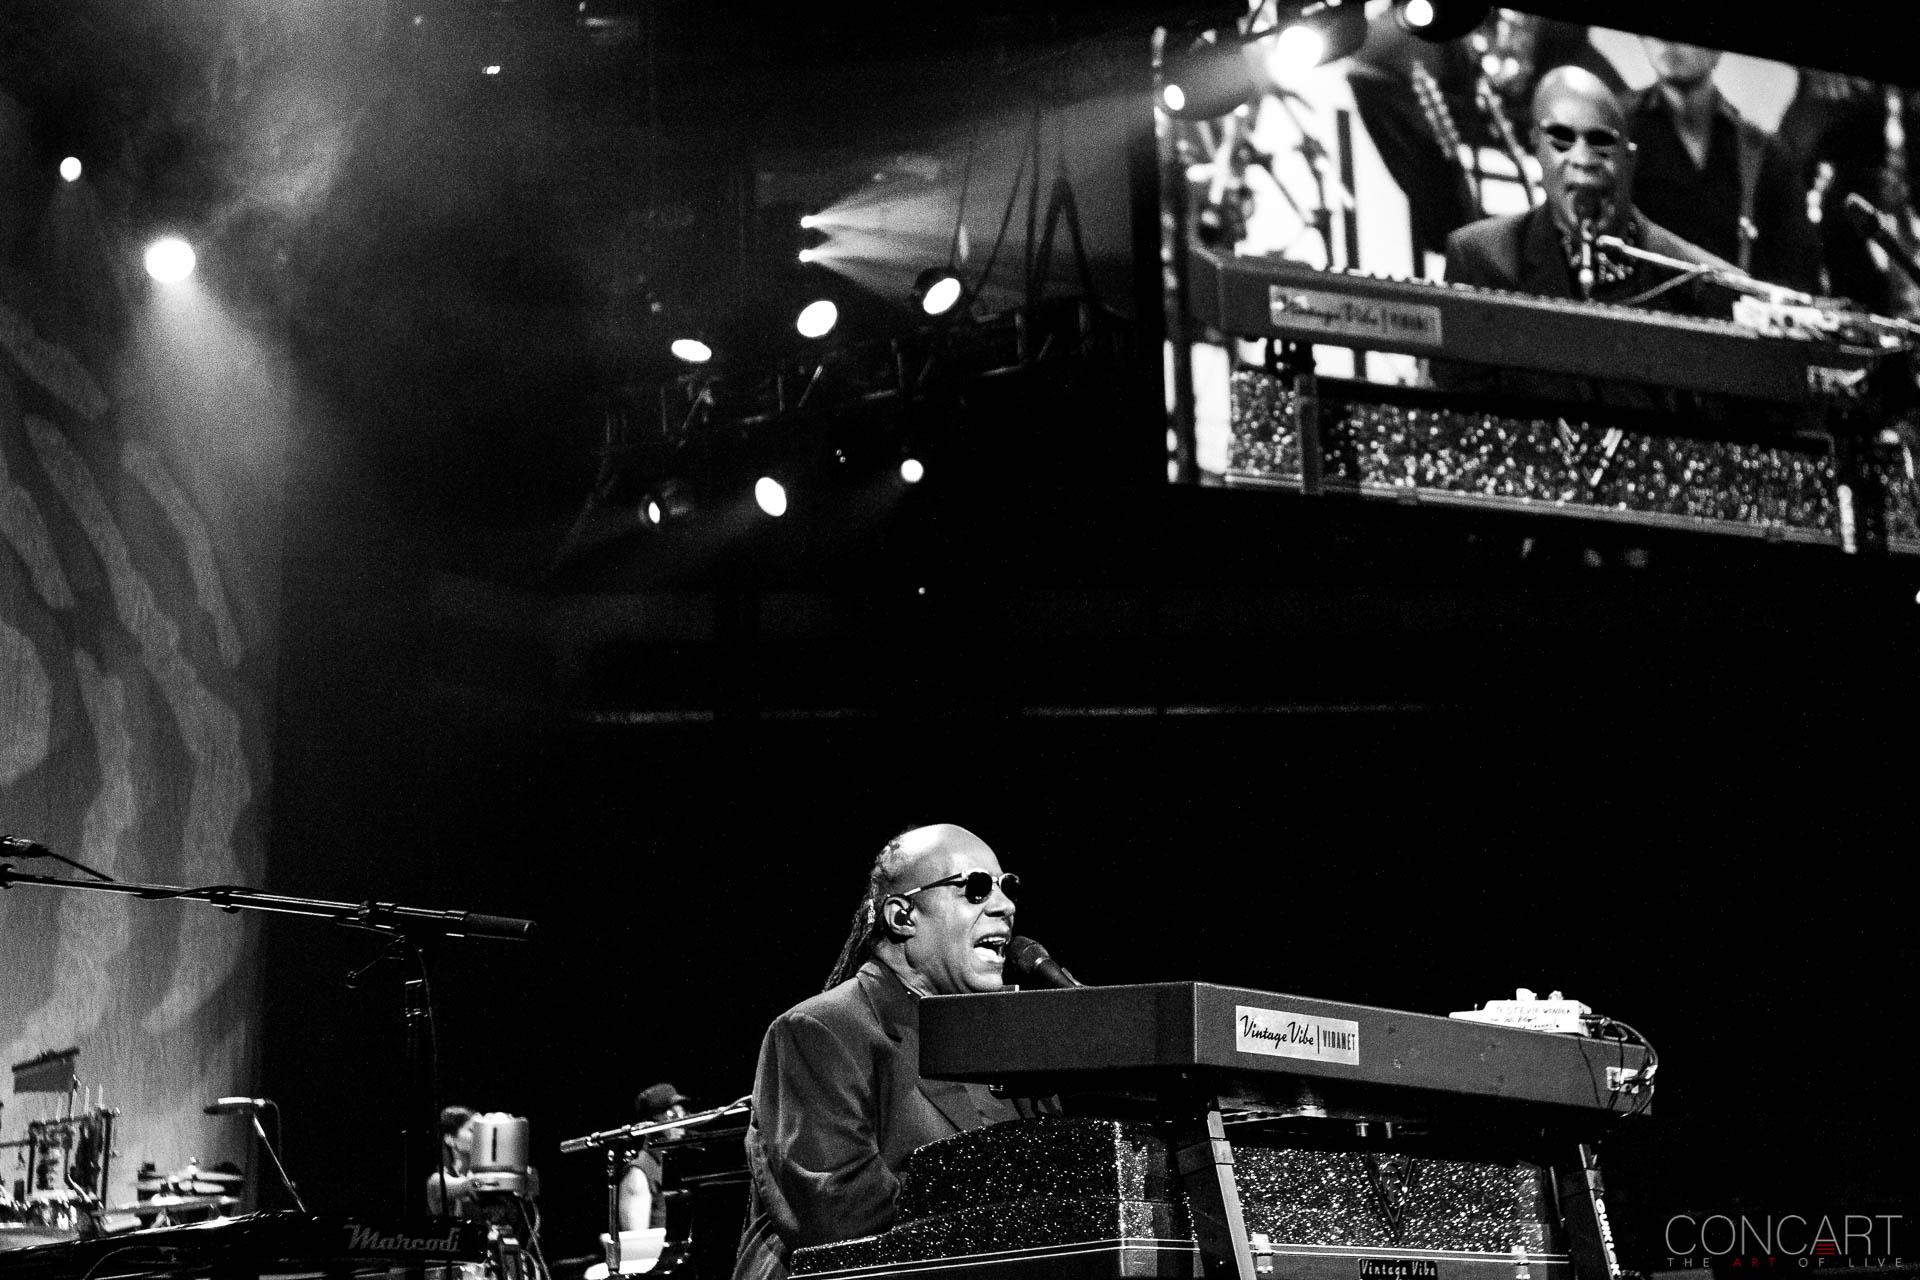 Stevie Wonder photo by Tyson White 12